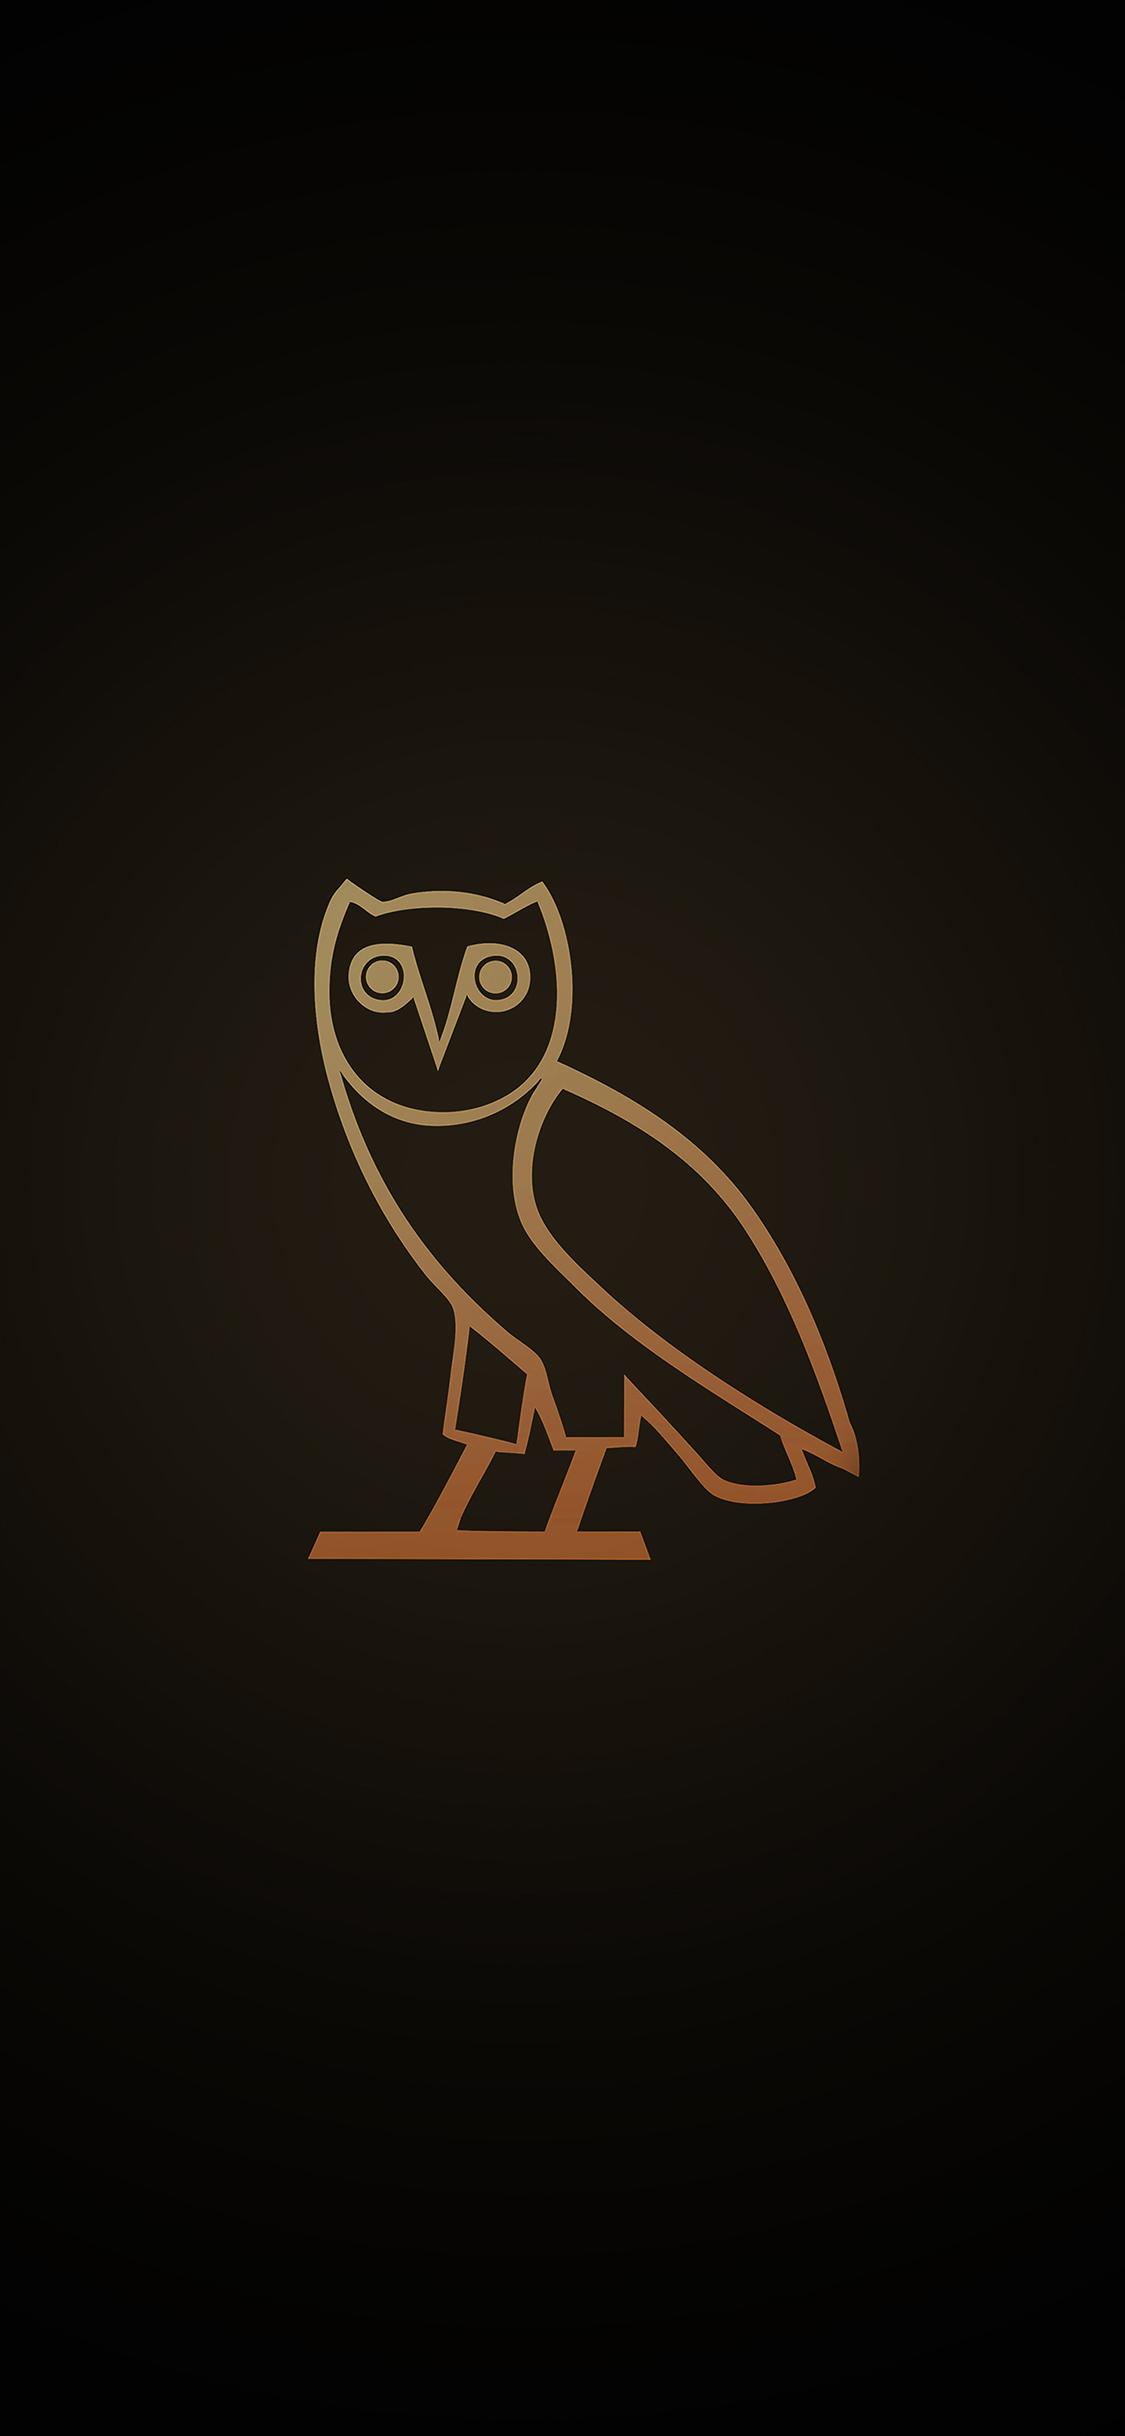 iPhoneXpapers.com-Apple-iPhone-wallpaper-ac82-wallpaper-ovo-owl-logo-dark-minimal